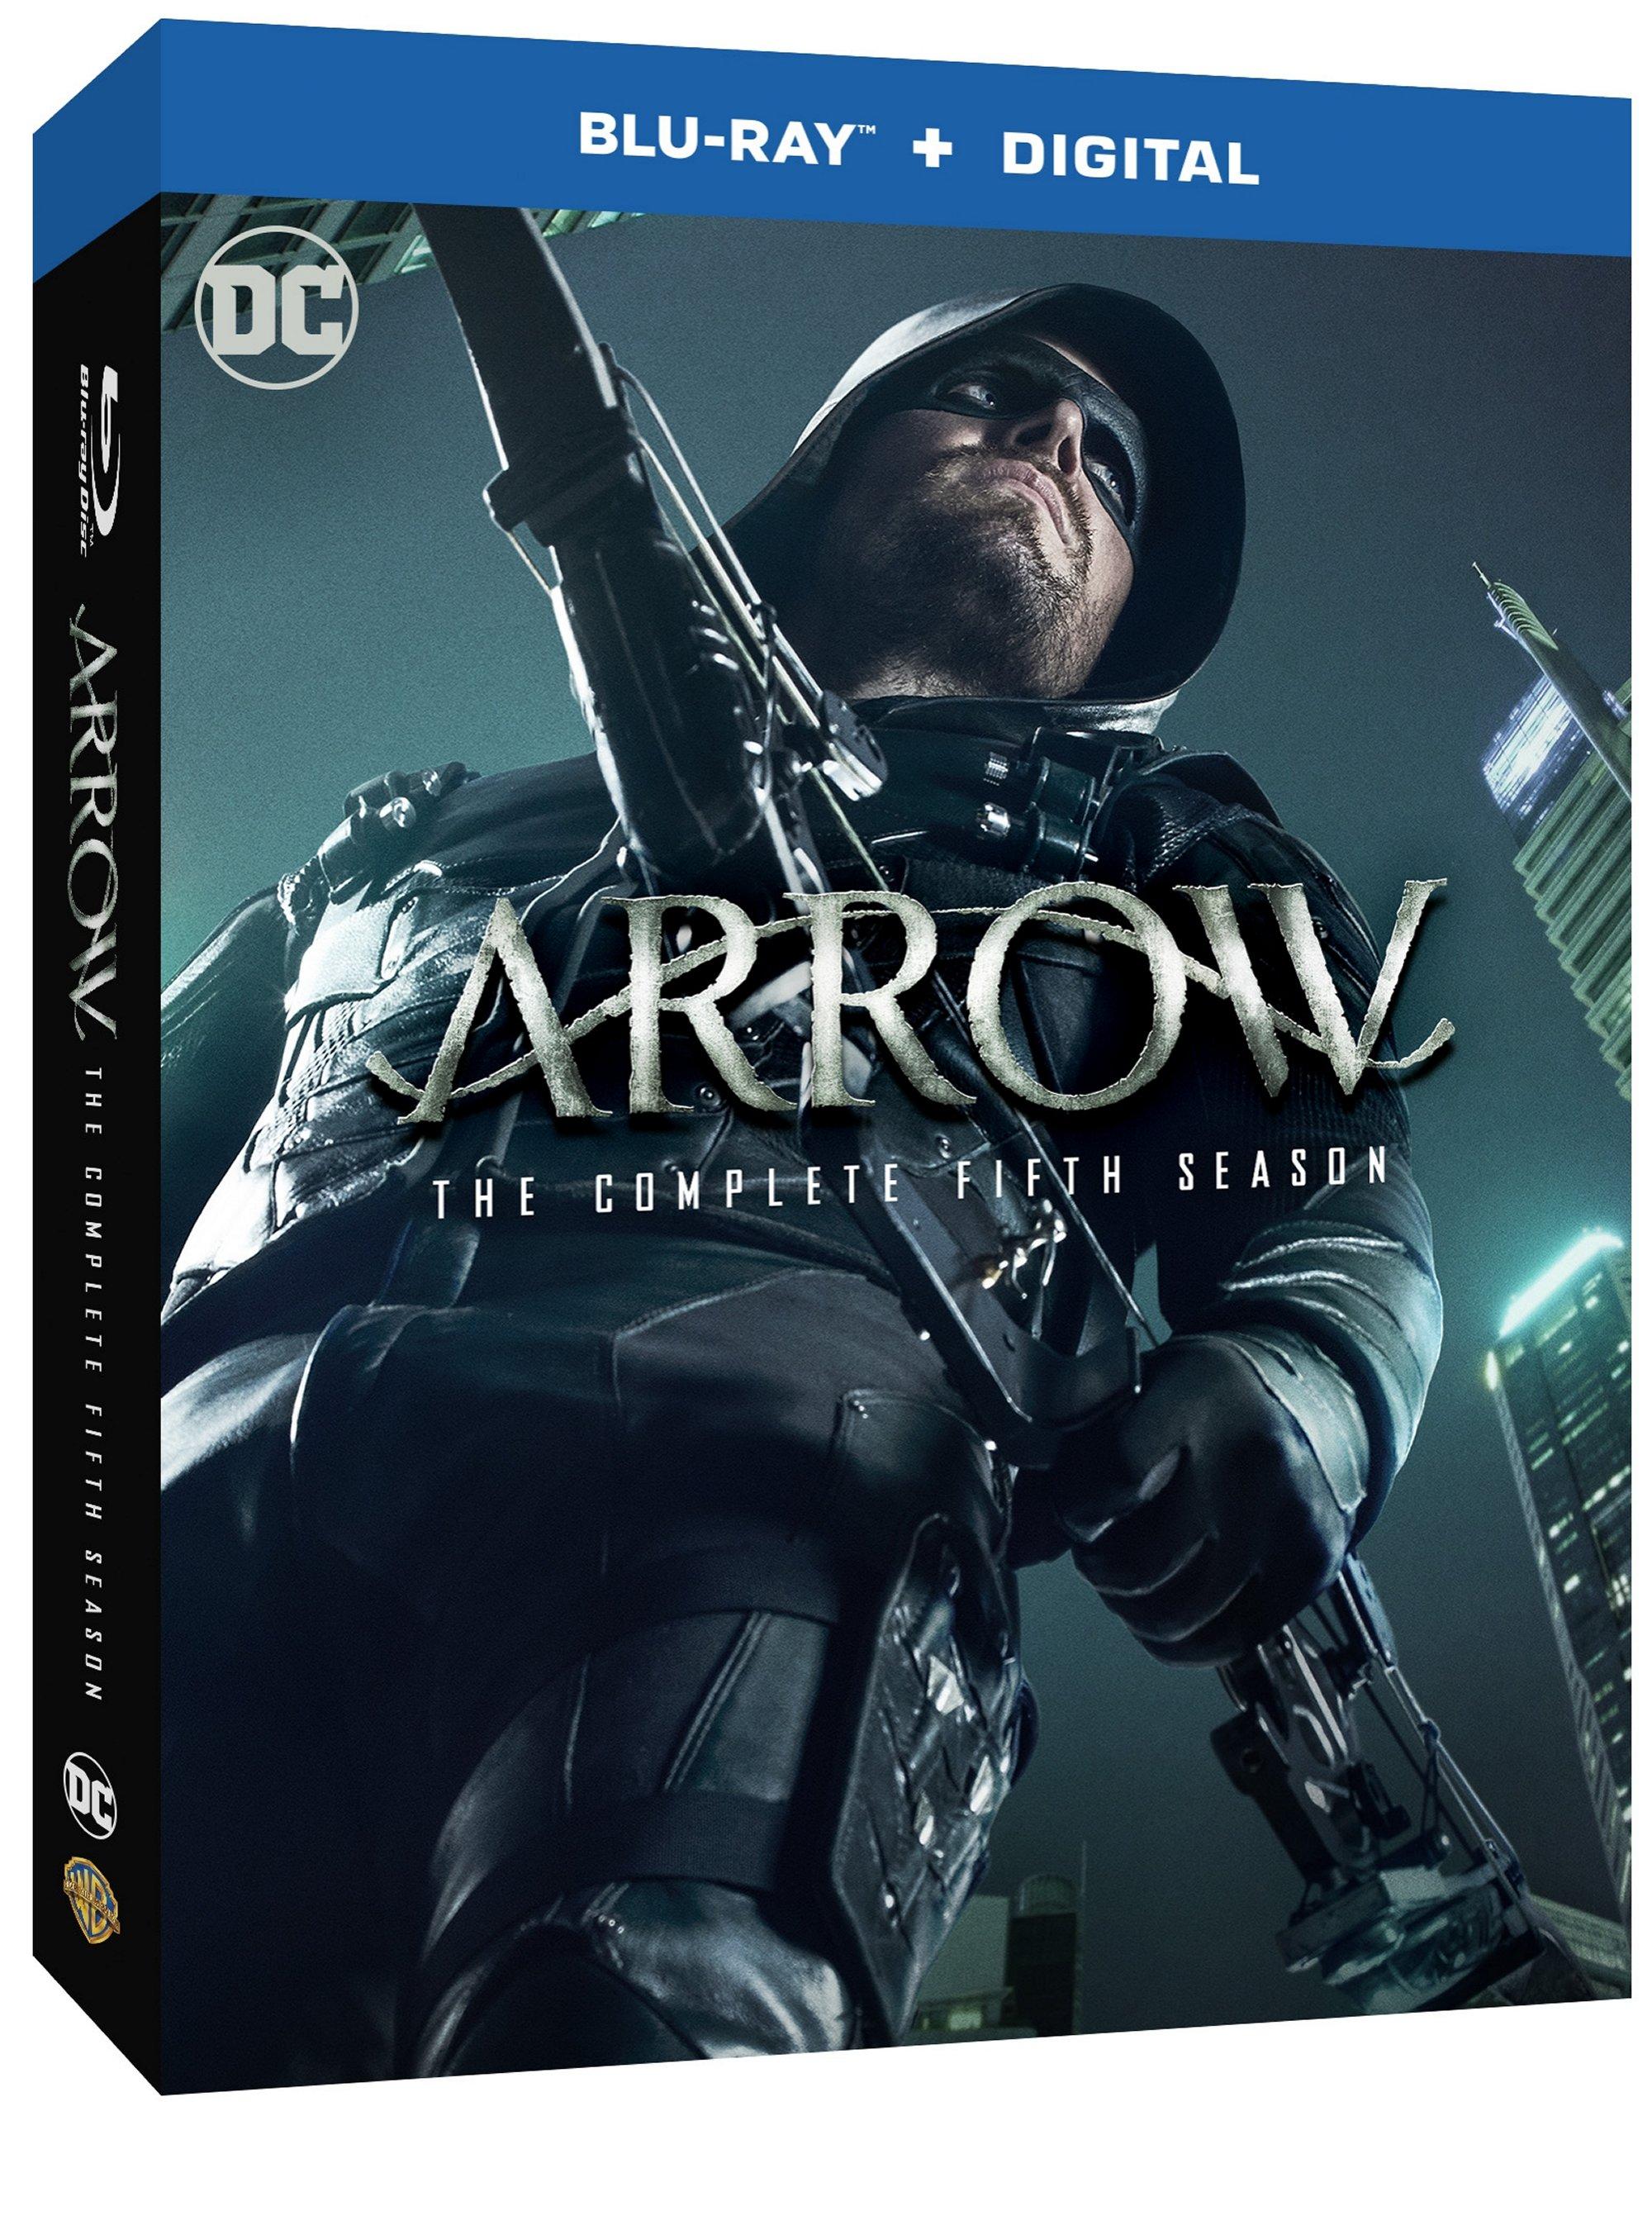 Arrow: The Complete Fifth Season (Blu-ray + Digital HD) by WARNER HOME VIDEO